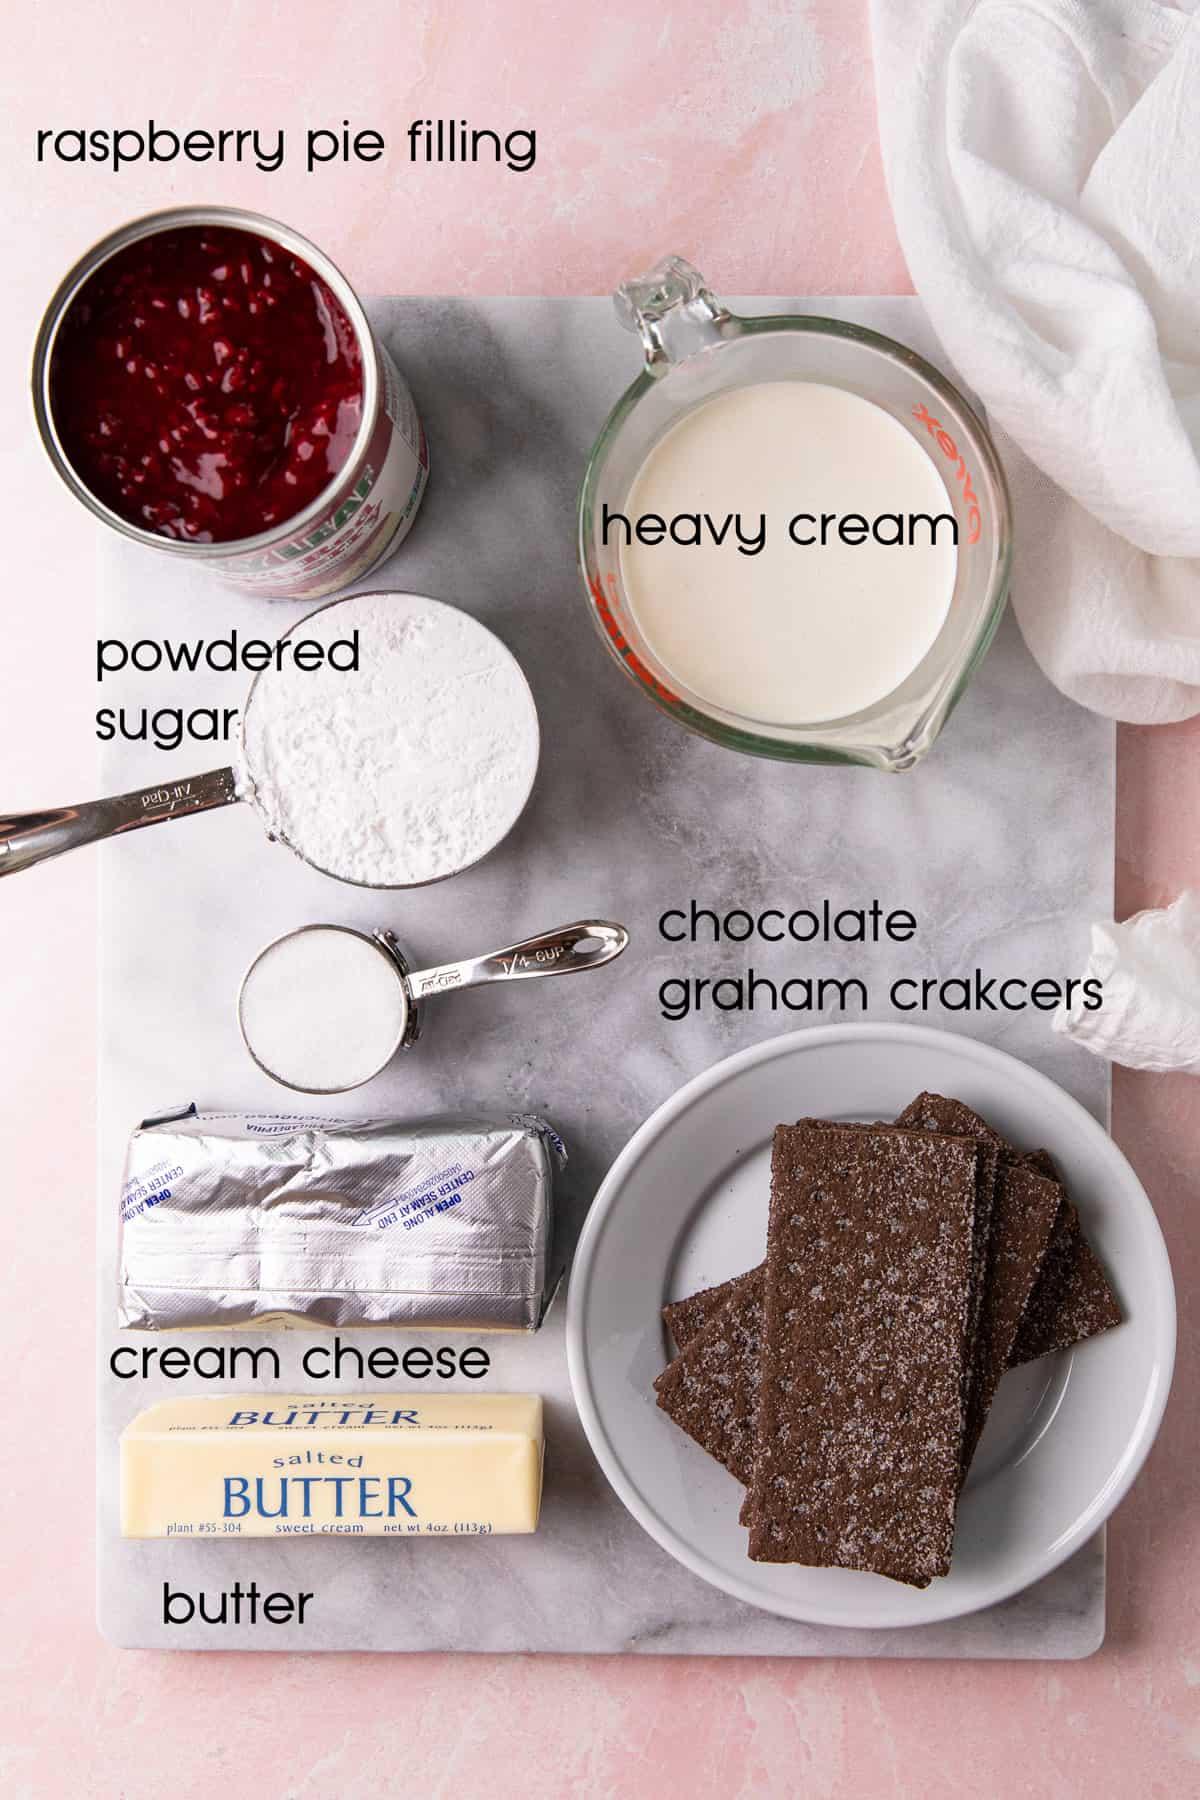 Recipe ingredients on a cutting board.